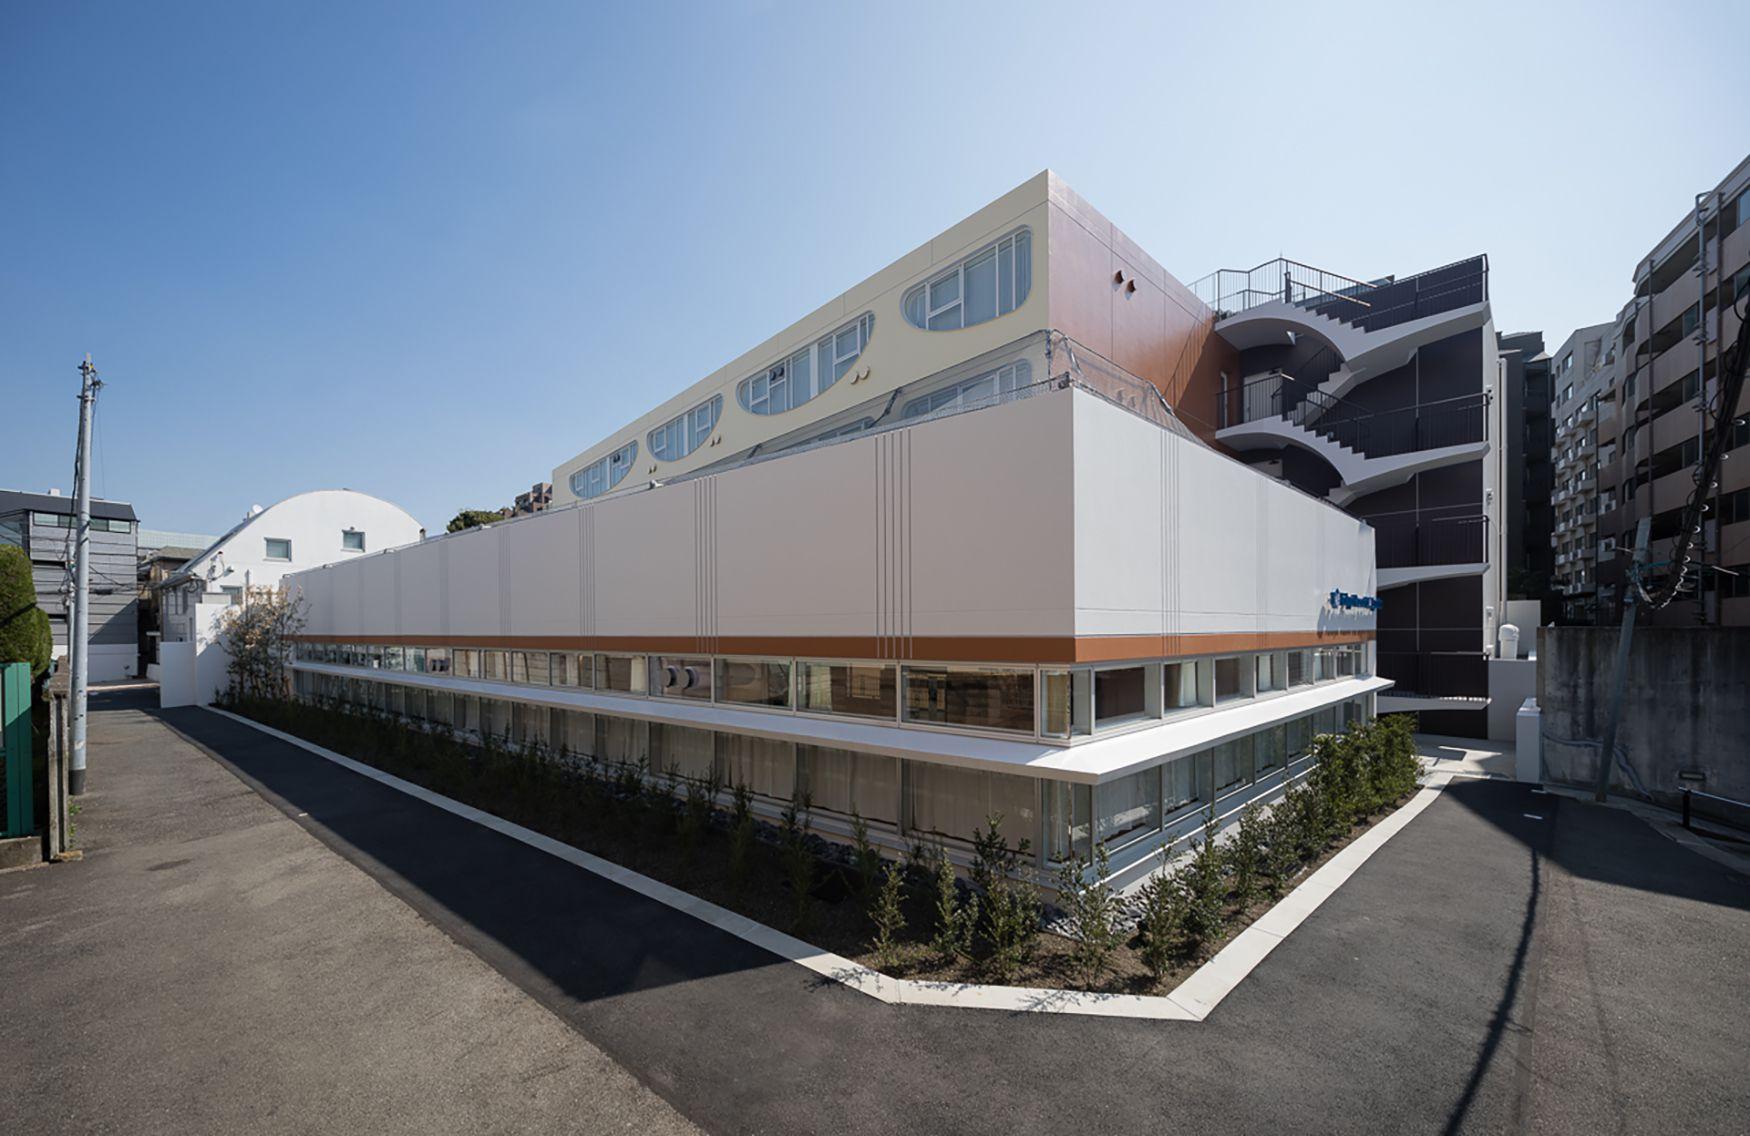 東京リゾート &スポーツ専門学校【照井康穂建築設計事務所】